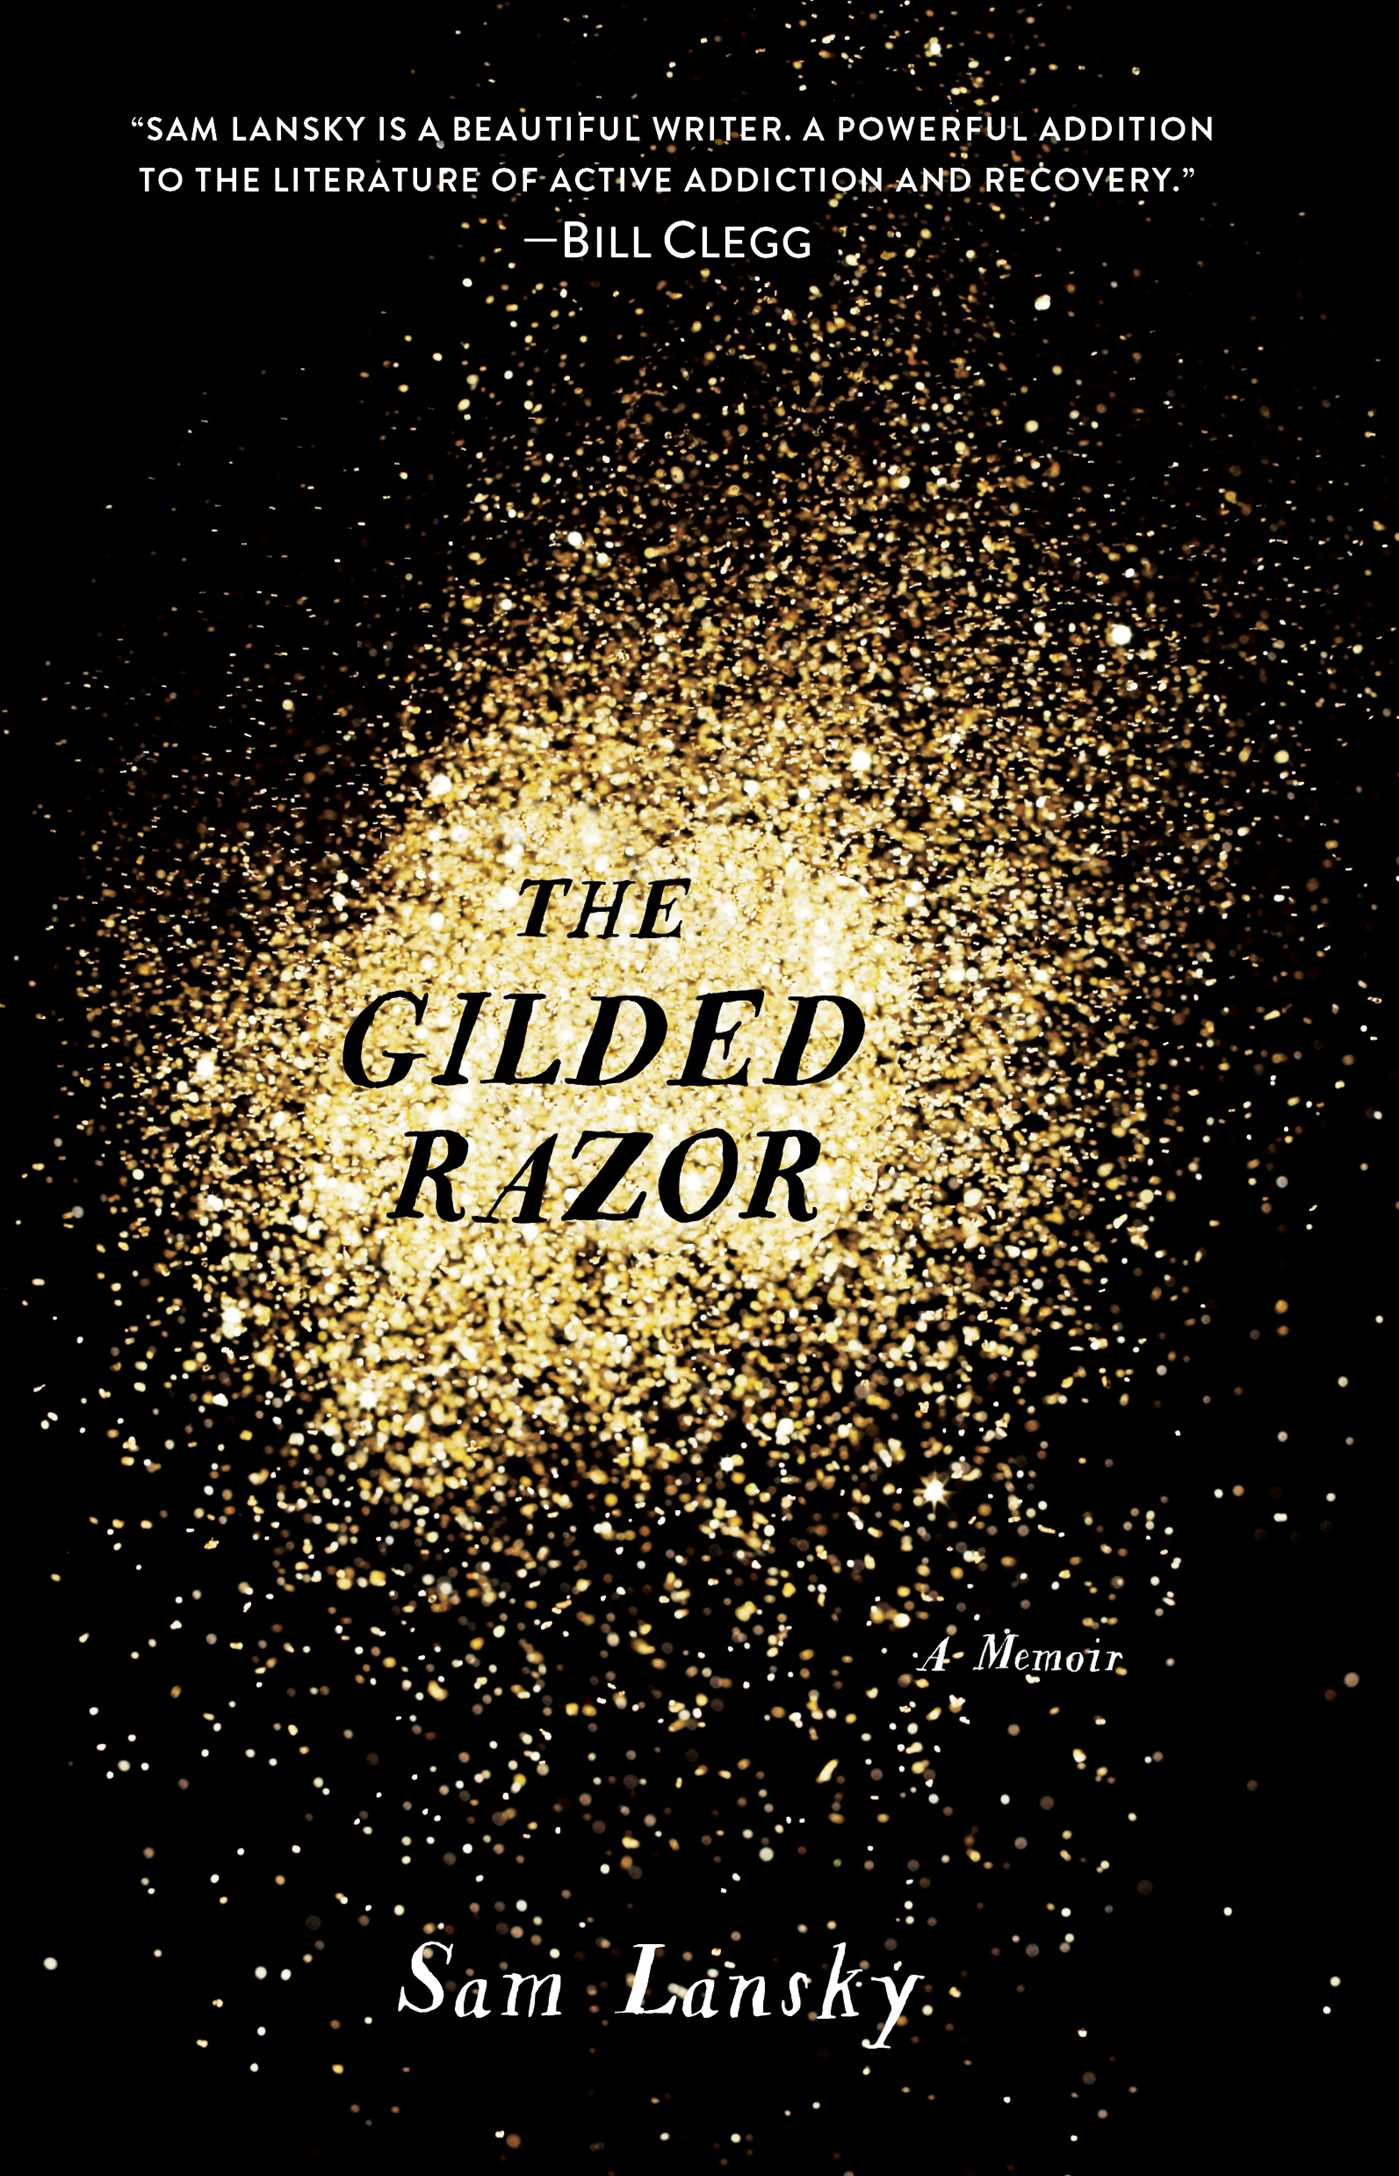 The gilded razor 9781476776163 hr